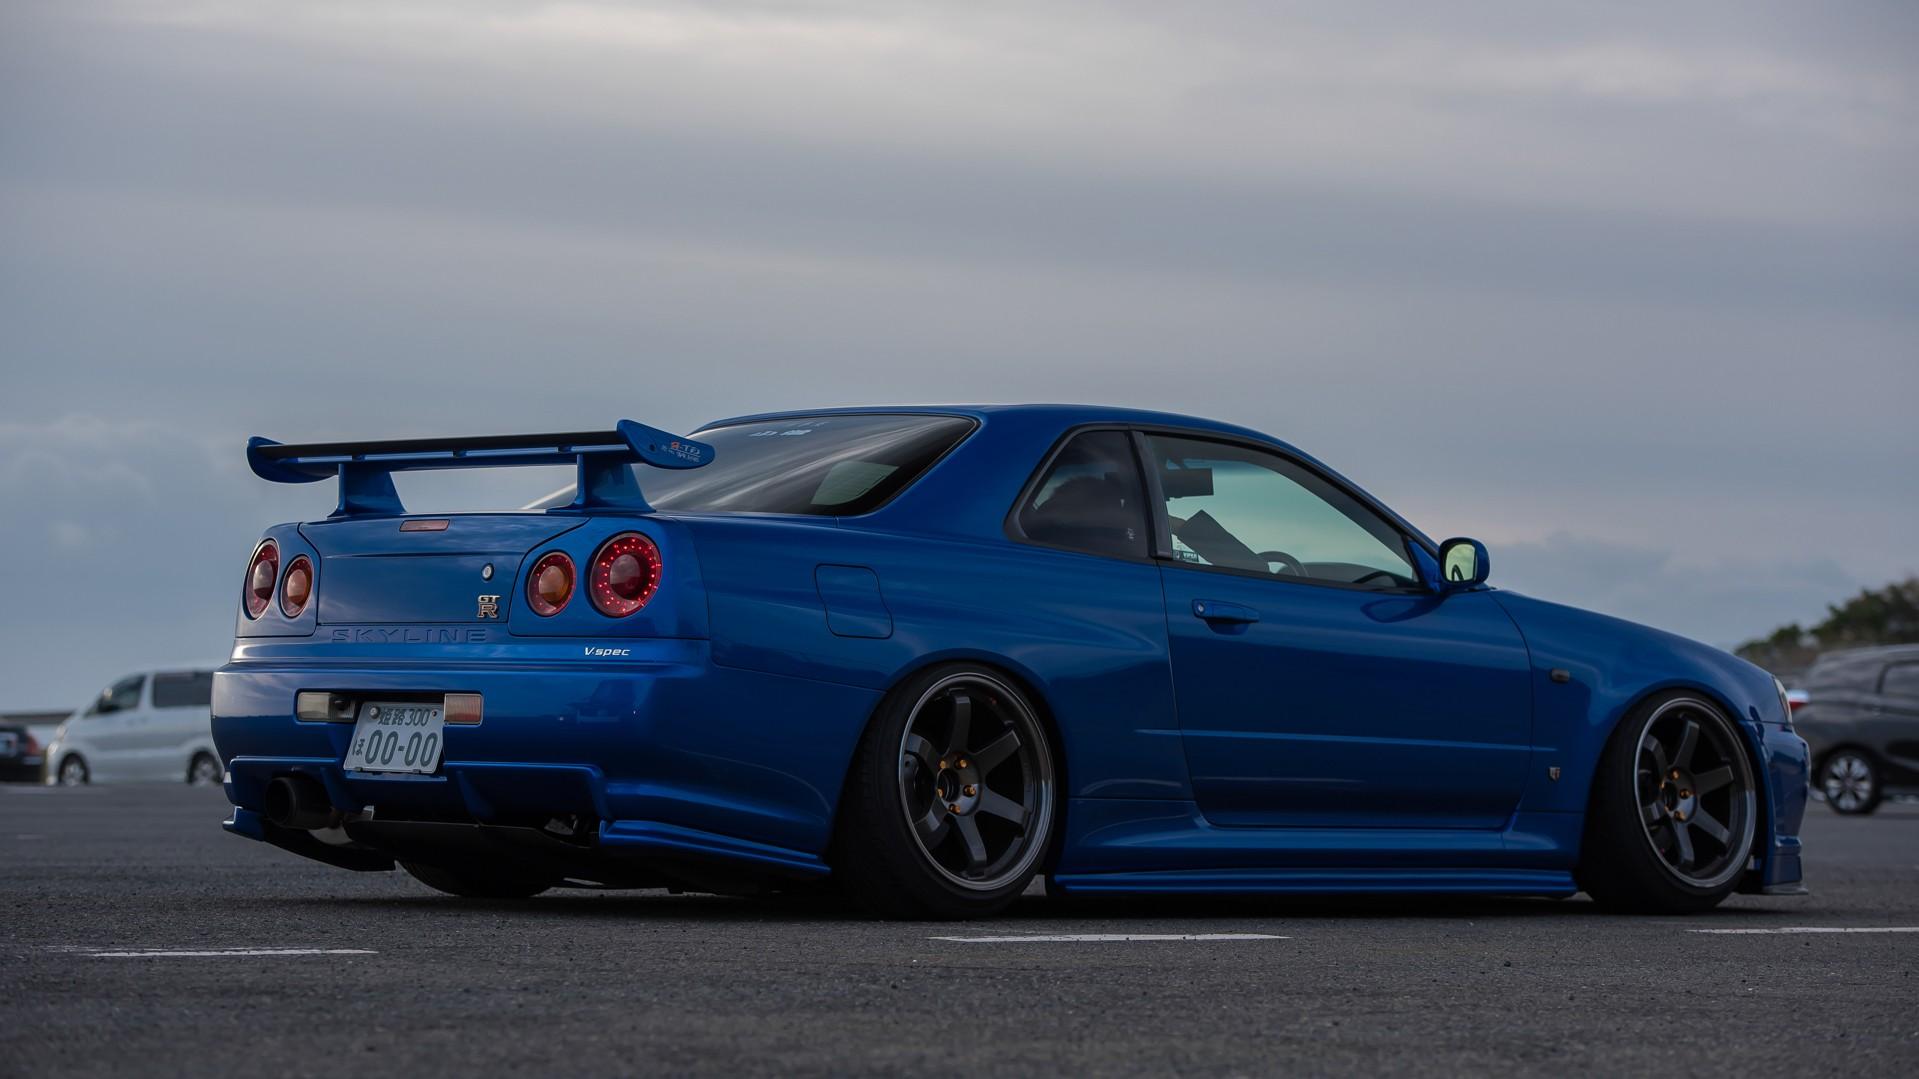 wallpaper : blue cars, skyline, honda, jdm, wheels, sports car, nissan  skyline, stance, performance car, skyline r34, camber, nissan skyline gt r  r34 nismo